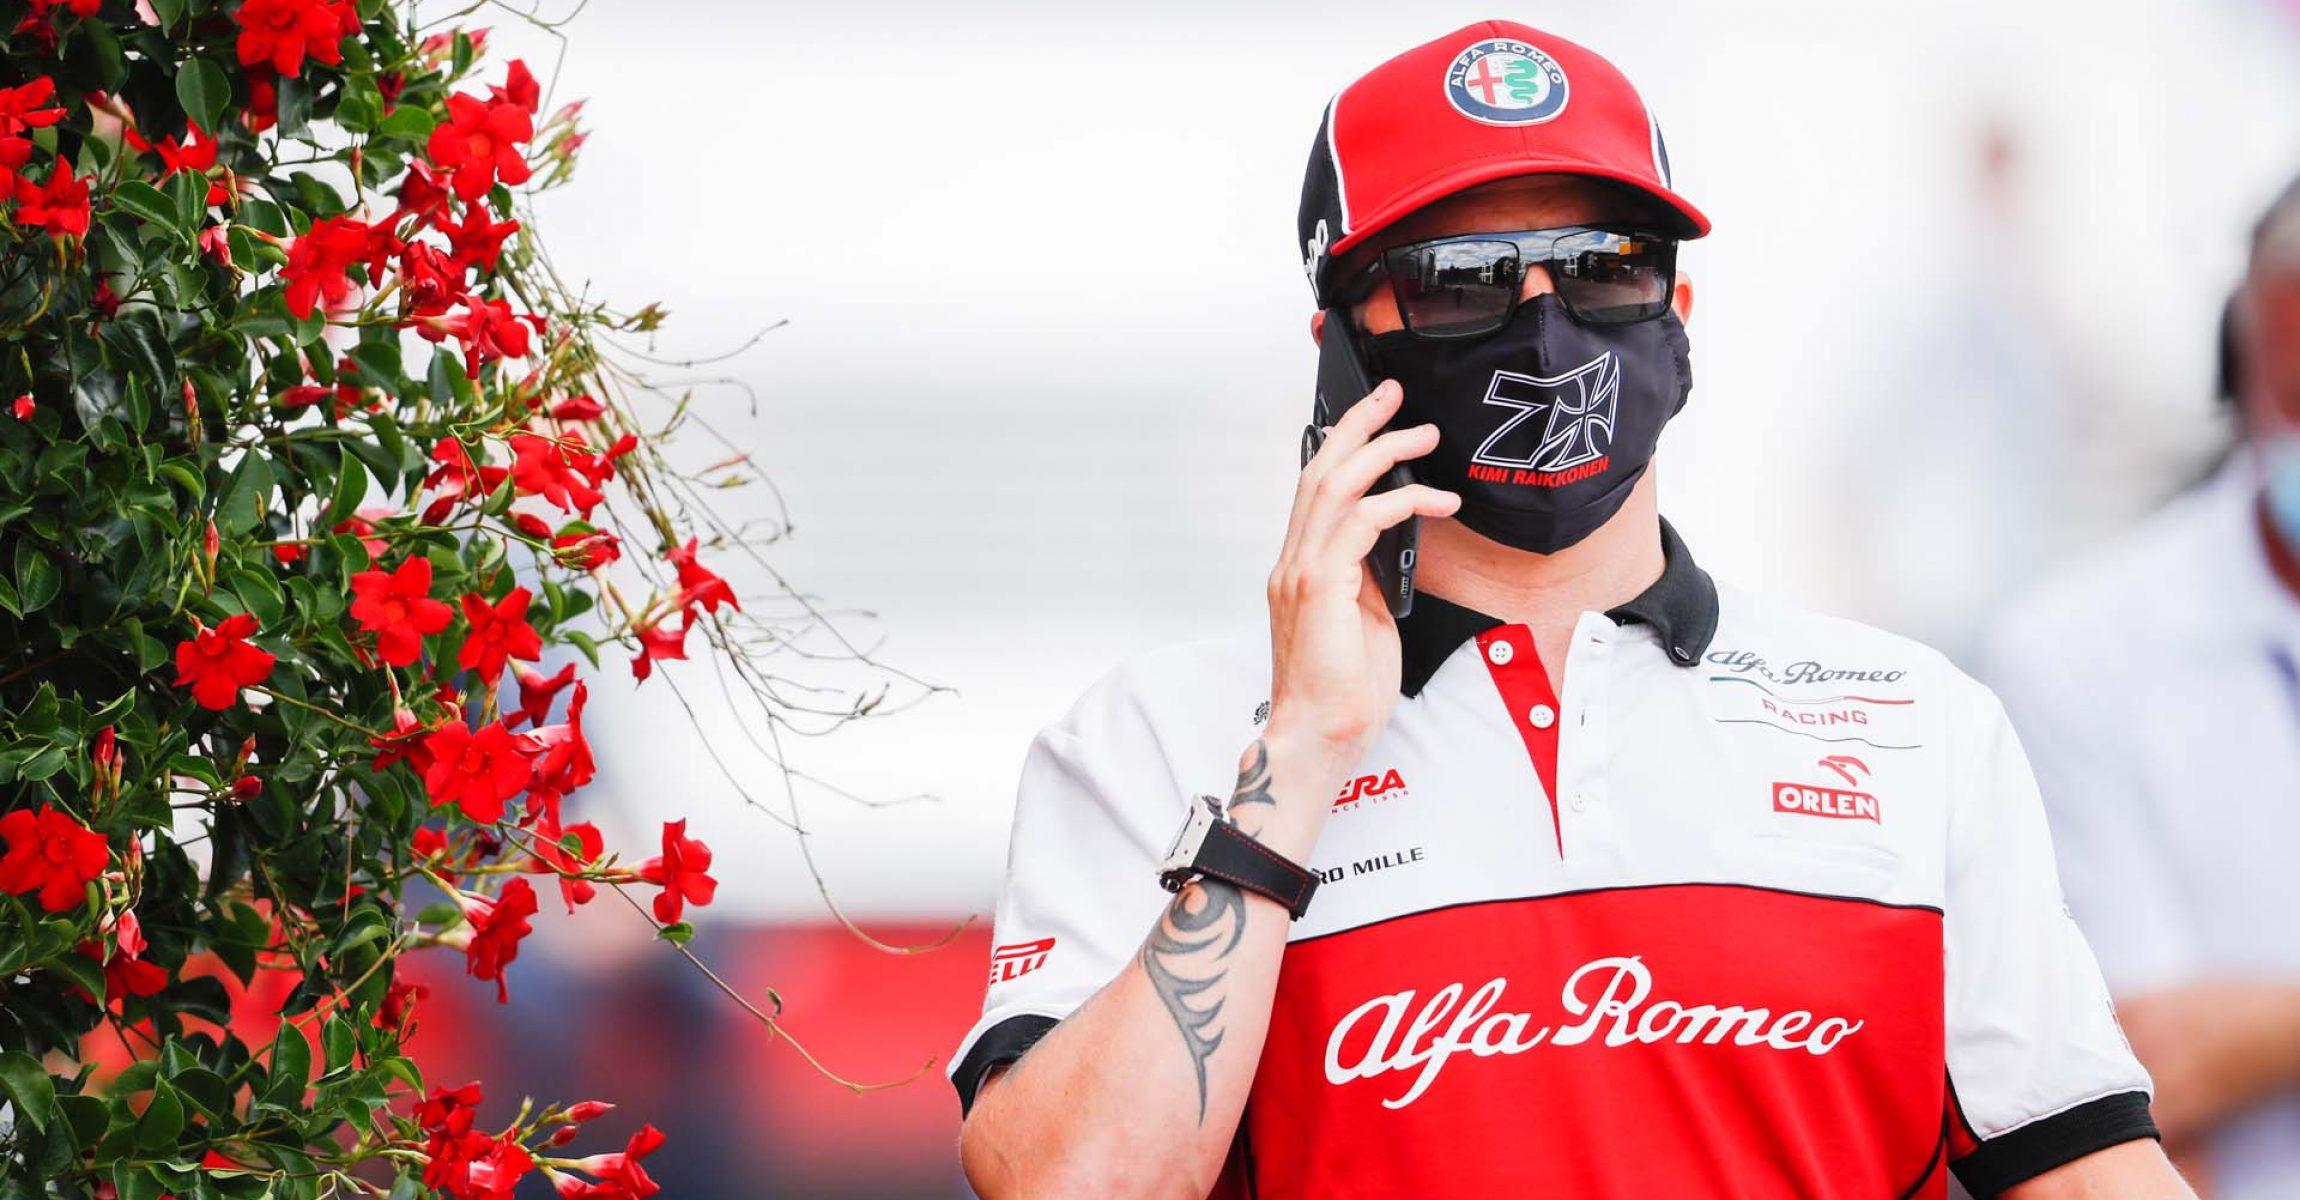 RAIKKONEN Kimi Räikkönen (fin), Alfa Romeo Racing ORLEN C39, portrait during the Formula 1 Rolex Belgian Grand Prix 2020, from August 28 to 30, 2020 on the Circuit de Spa-Francorchamps, in Stavelot, near Liège, Belgium - Photo Antonin Vincent / DPPI